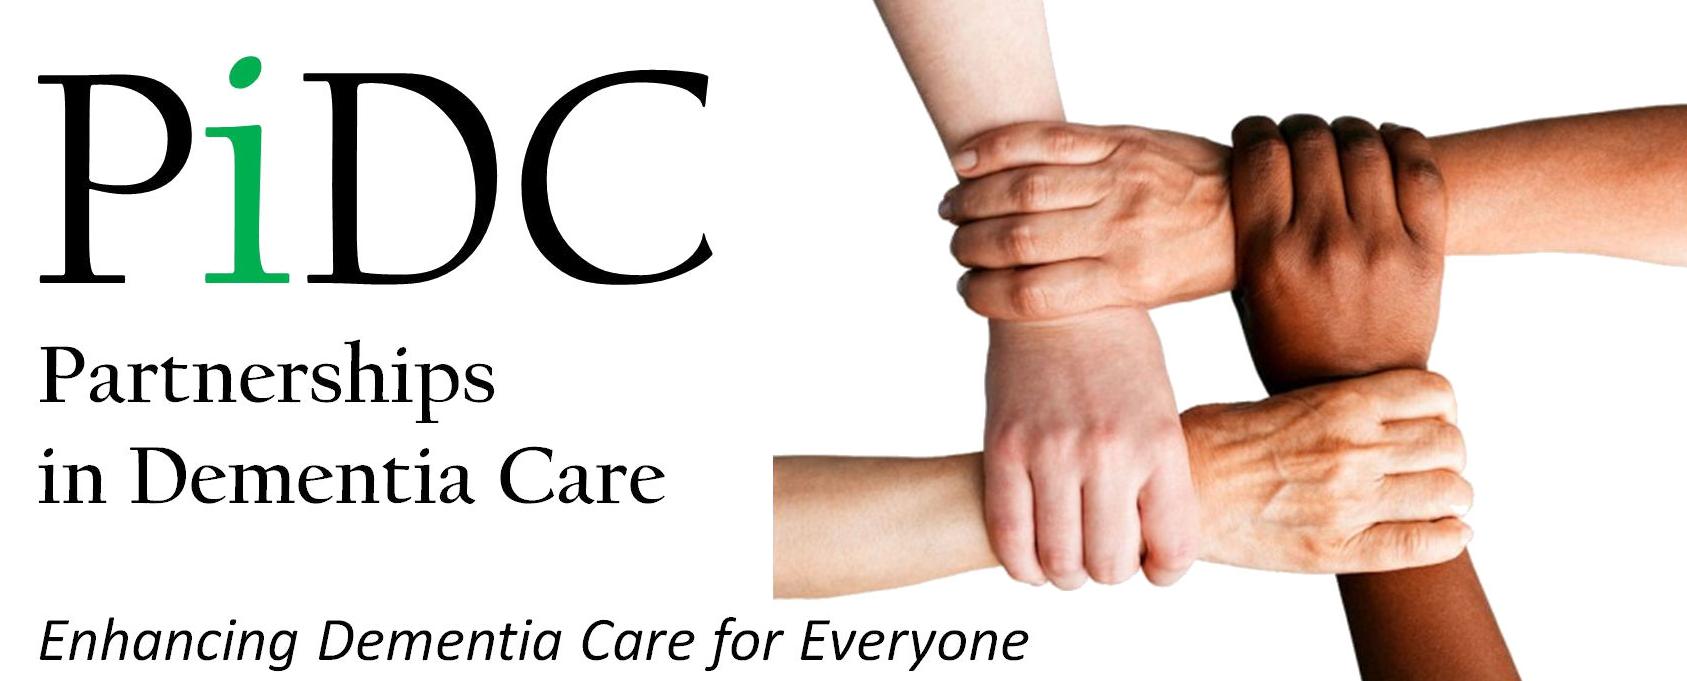 Our Team - PiDC Logo